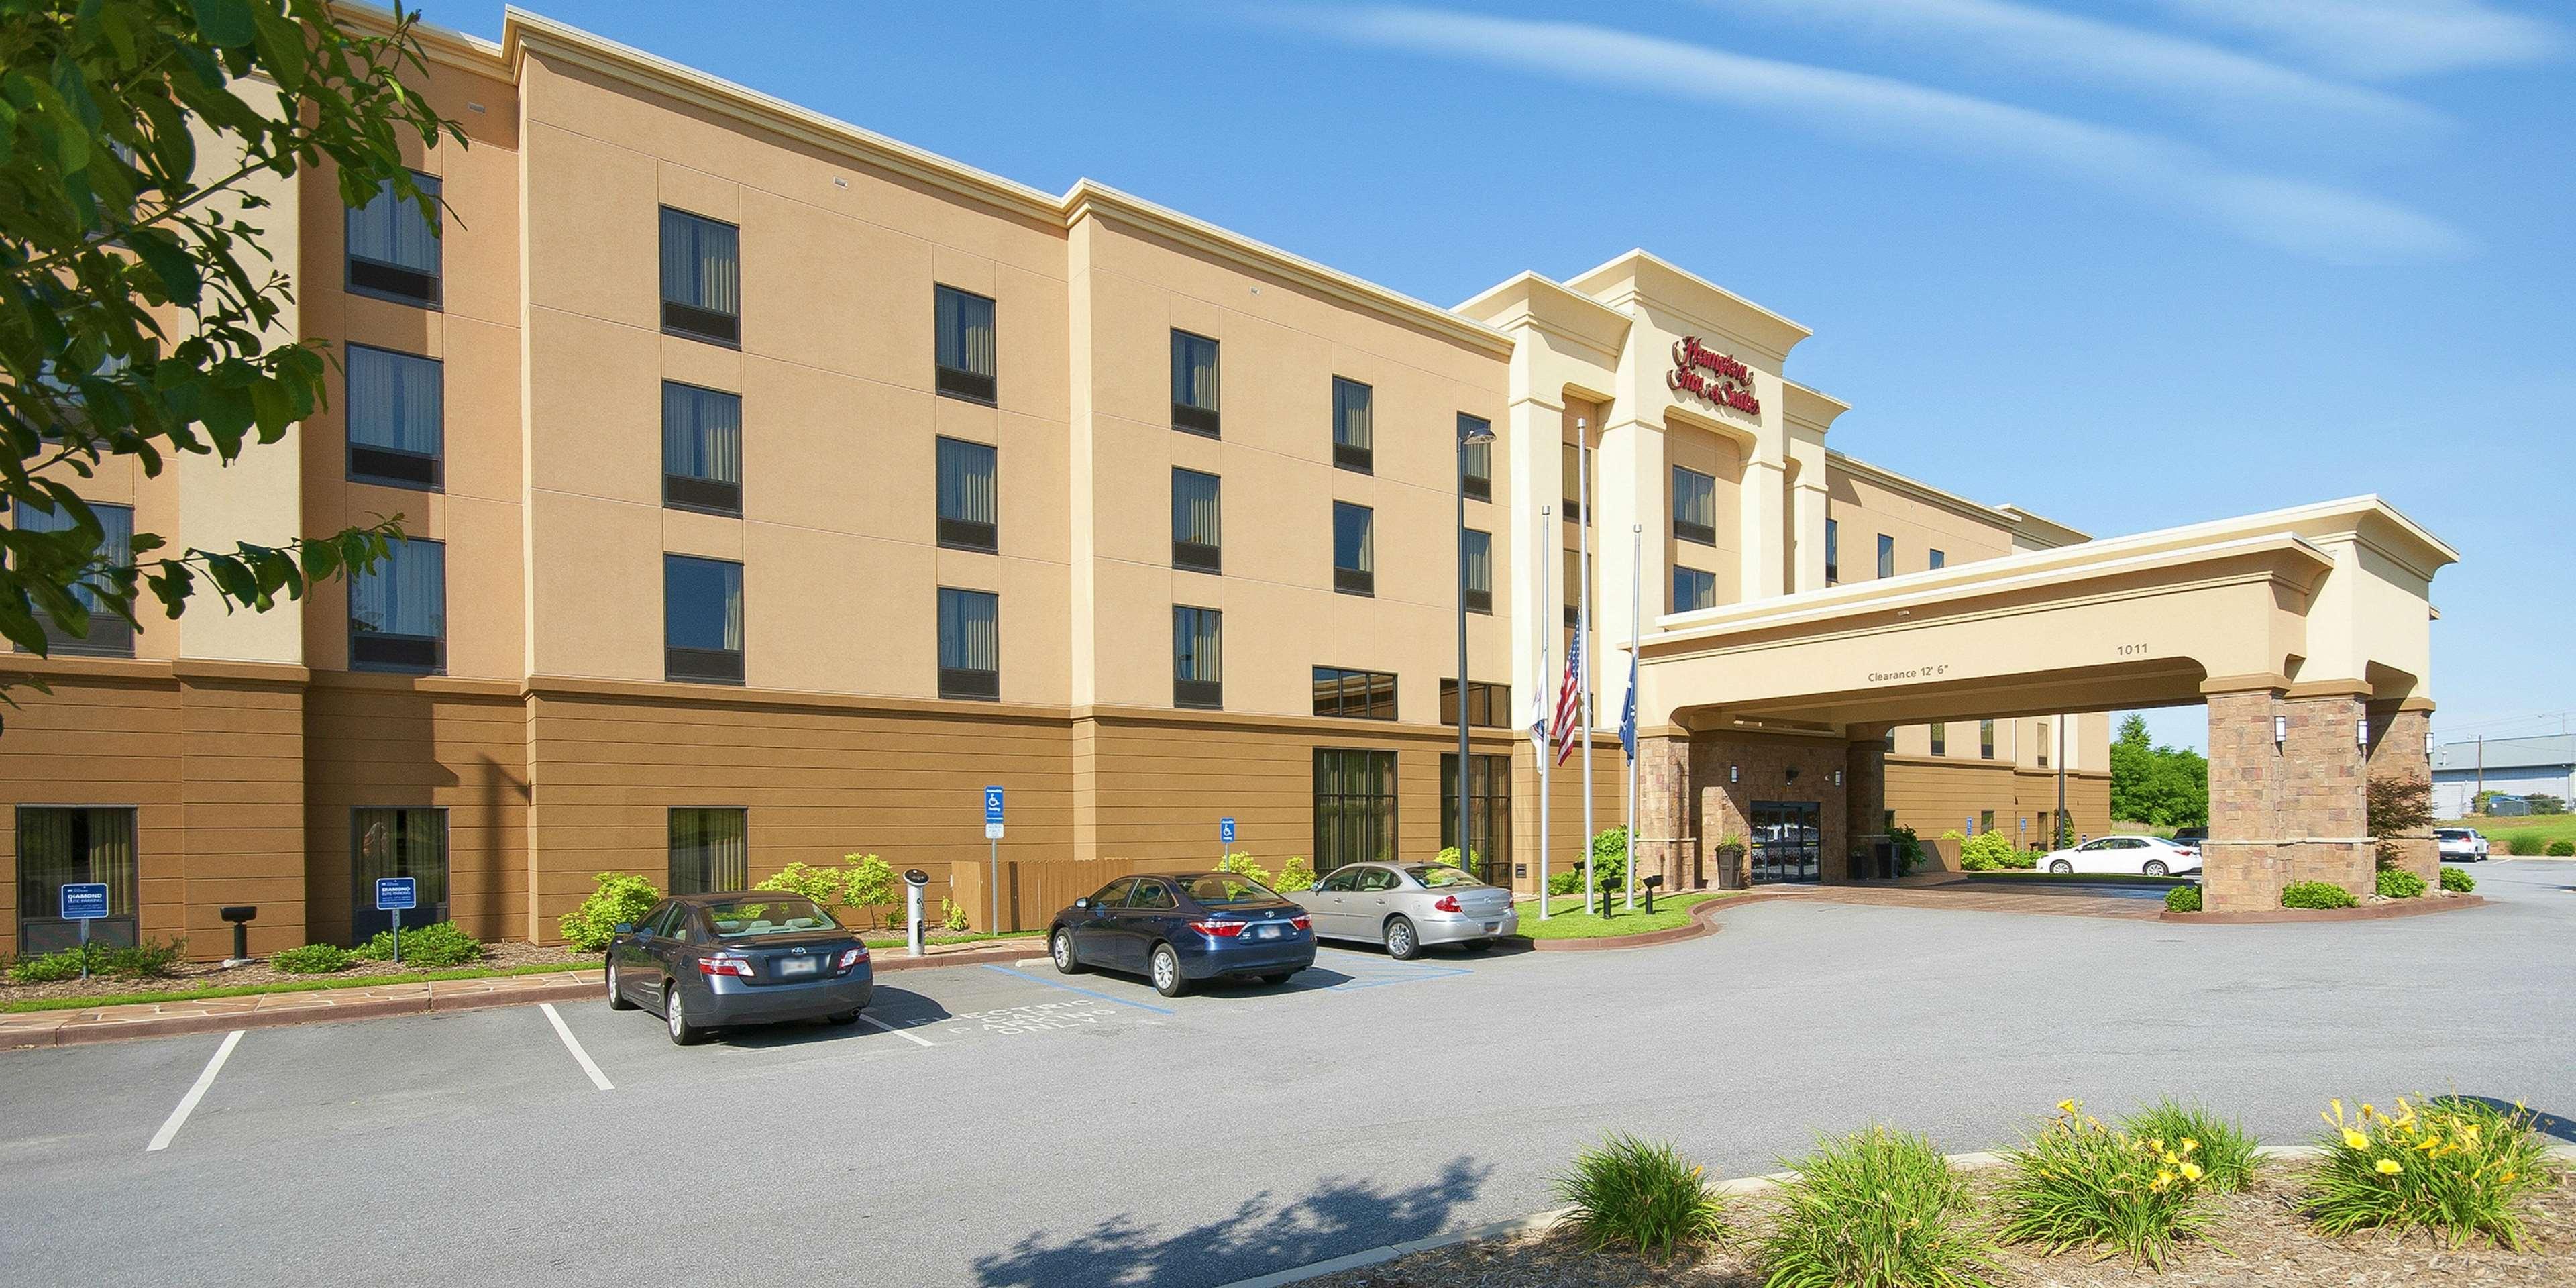 Hampton Inn & Suites Seneca-Clemson Area image 28